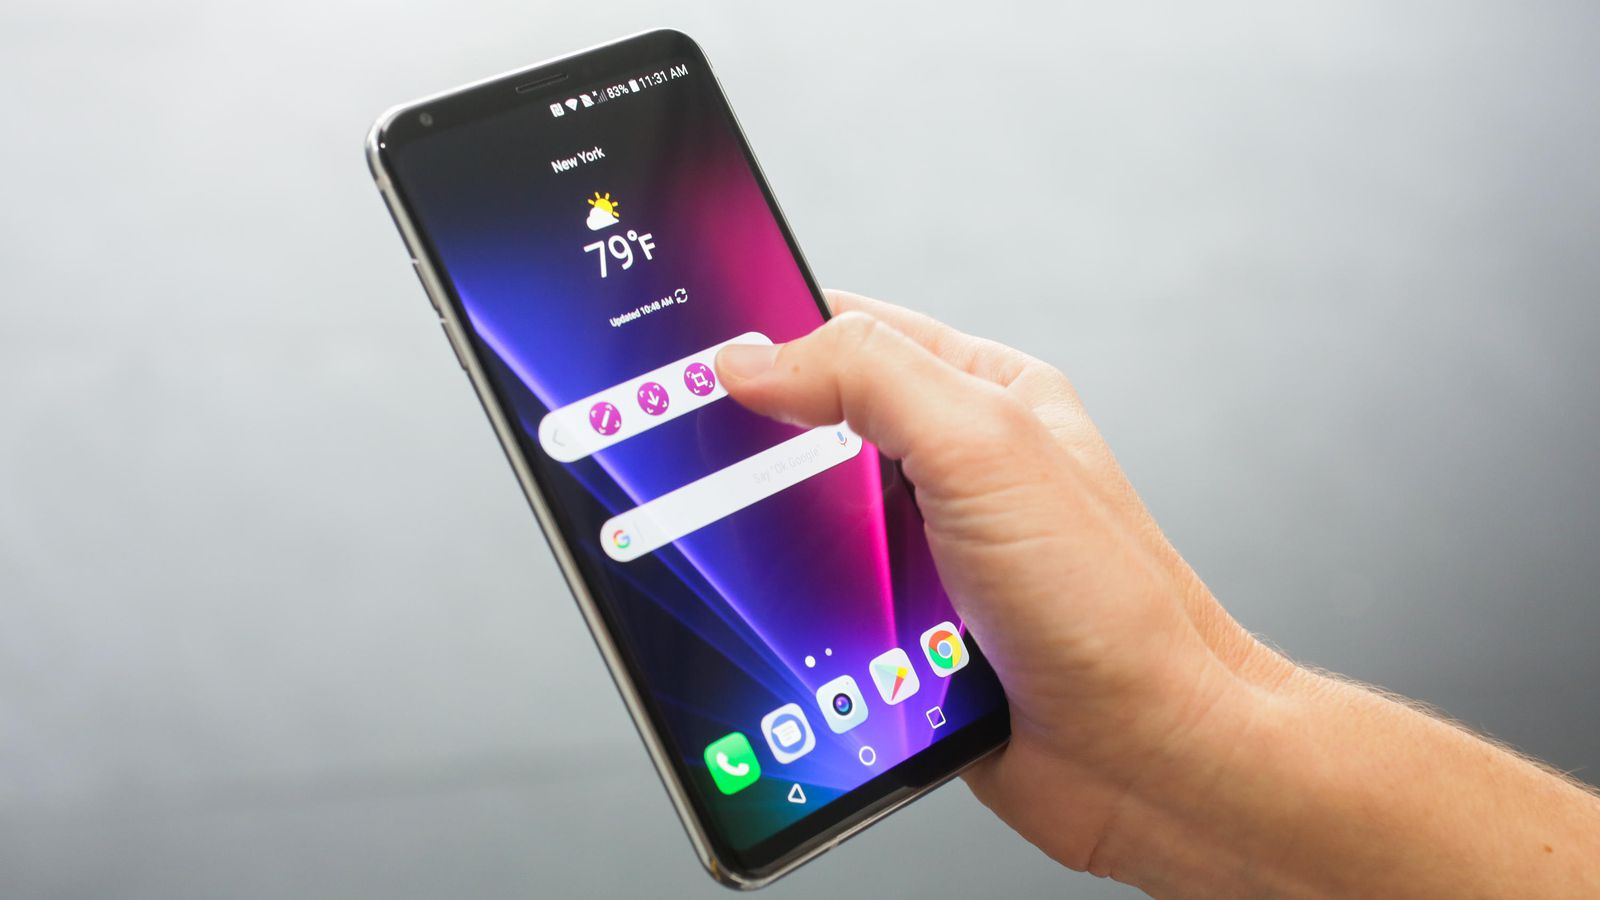 Free lg phone giveaway